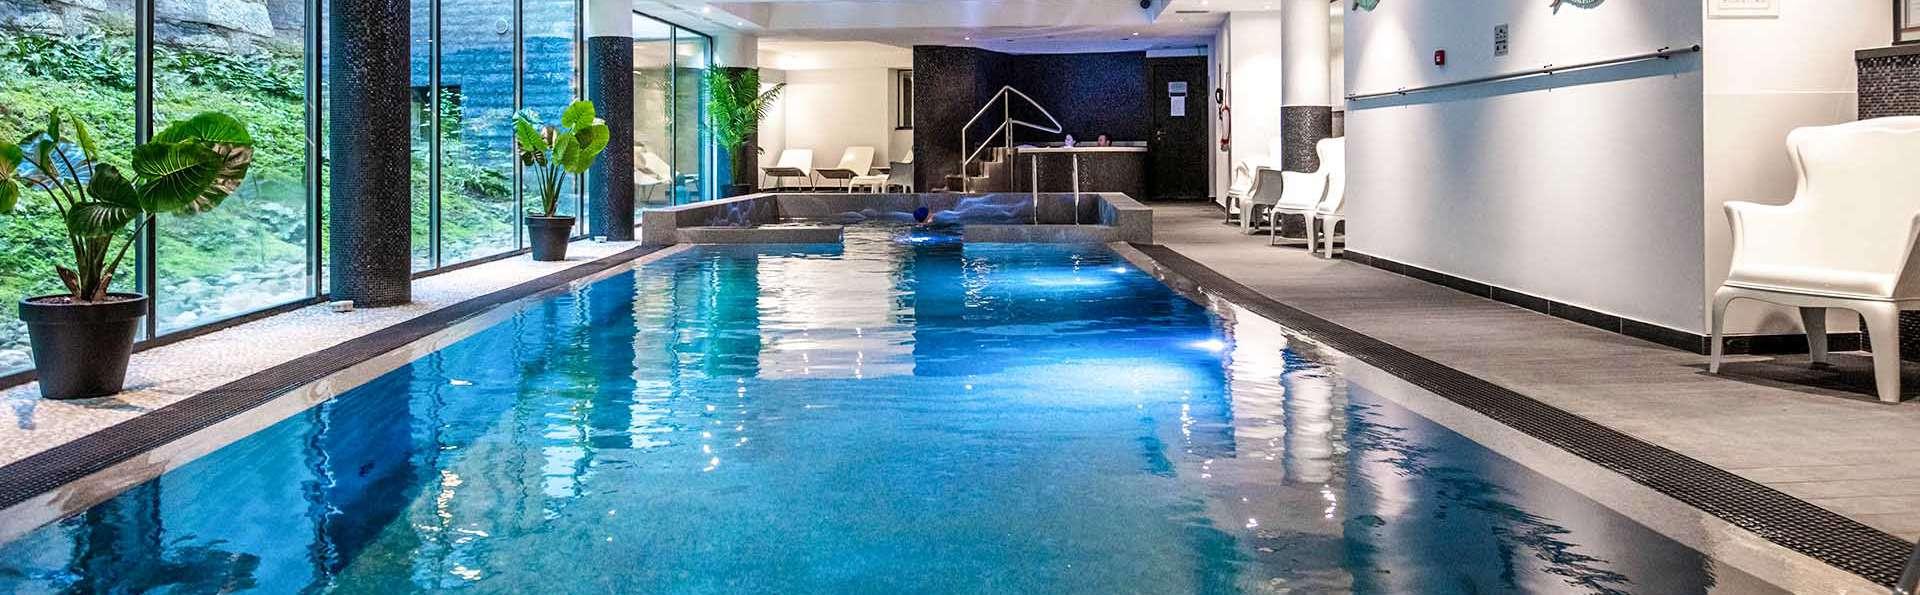 Hôtel Selys Liège  - EDIT_Osmose_HD_piscine_clarc_01.jpg